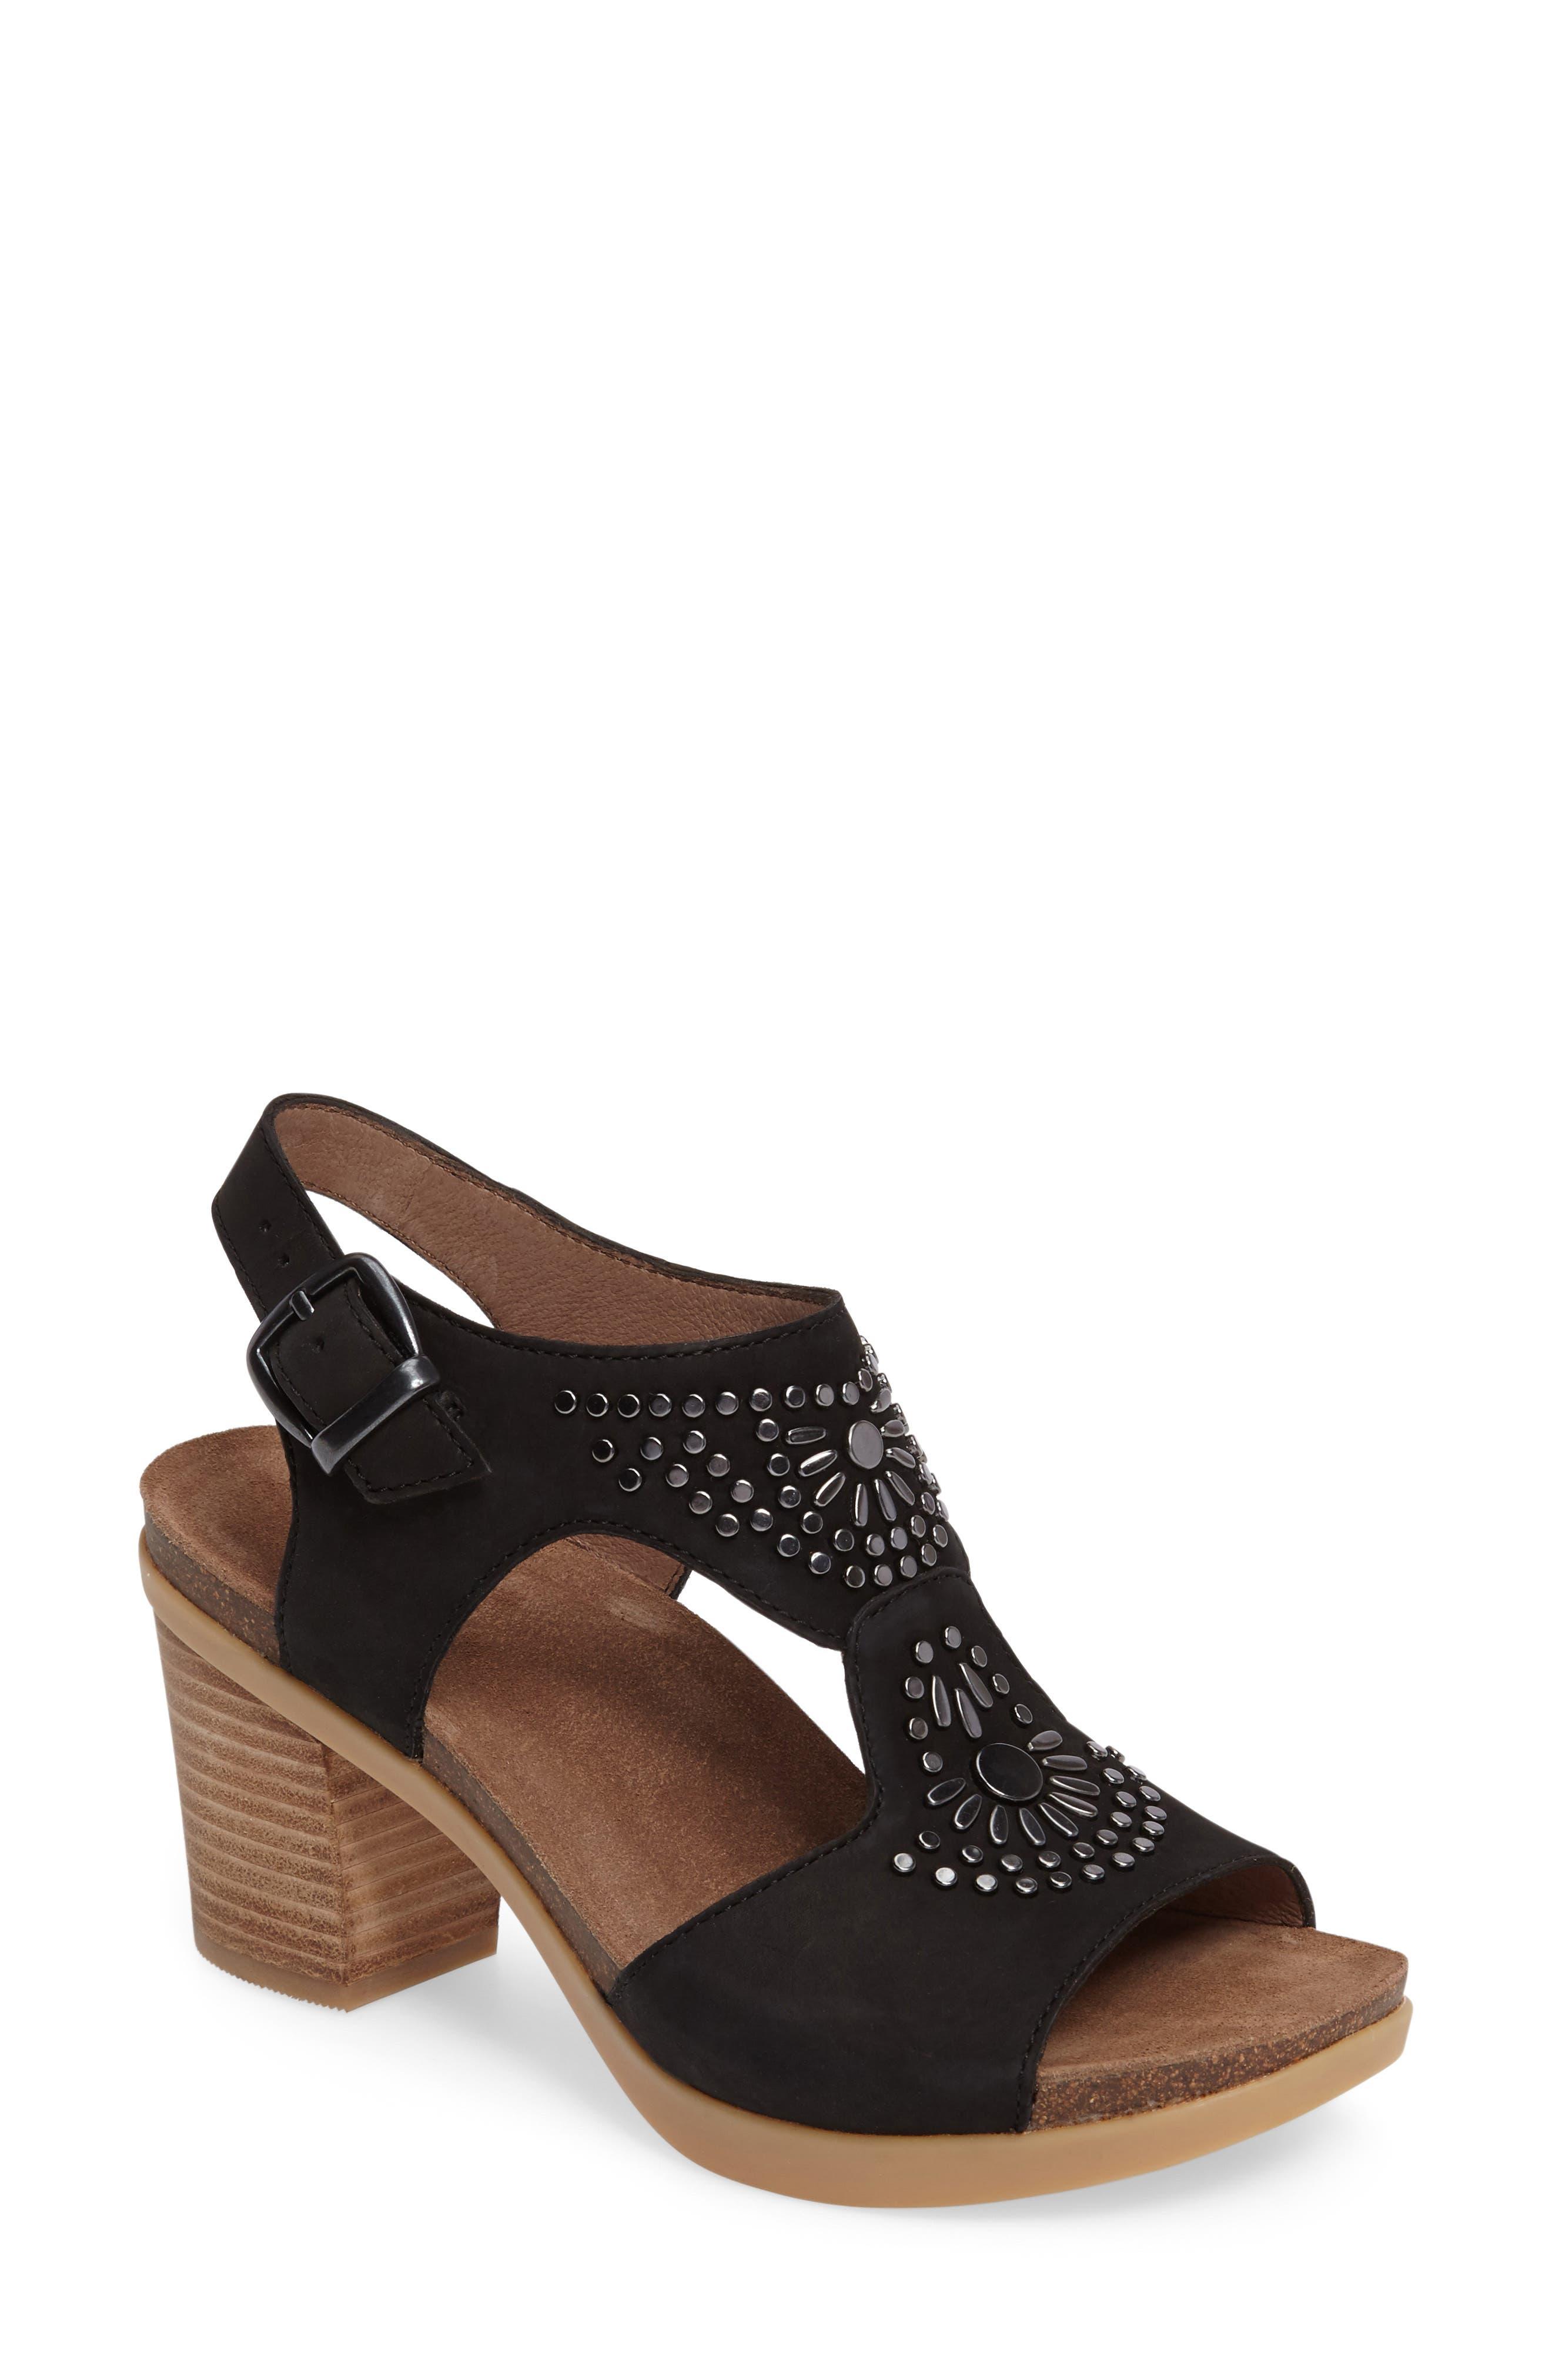 Deandra Studded Sandal,                         Main,                         color, 001